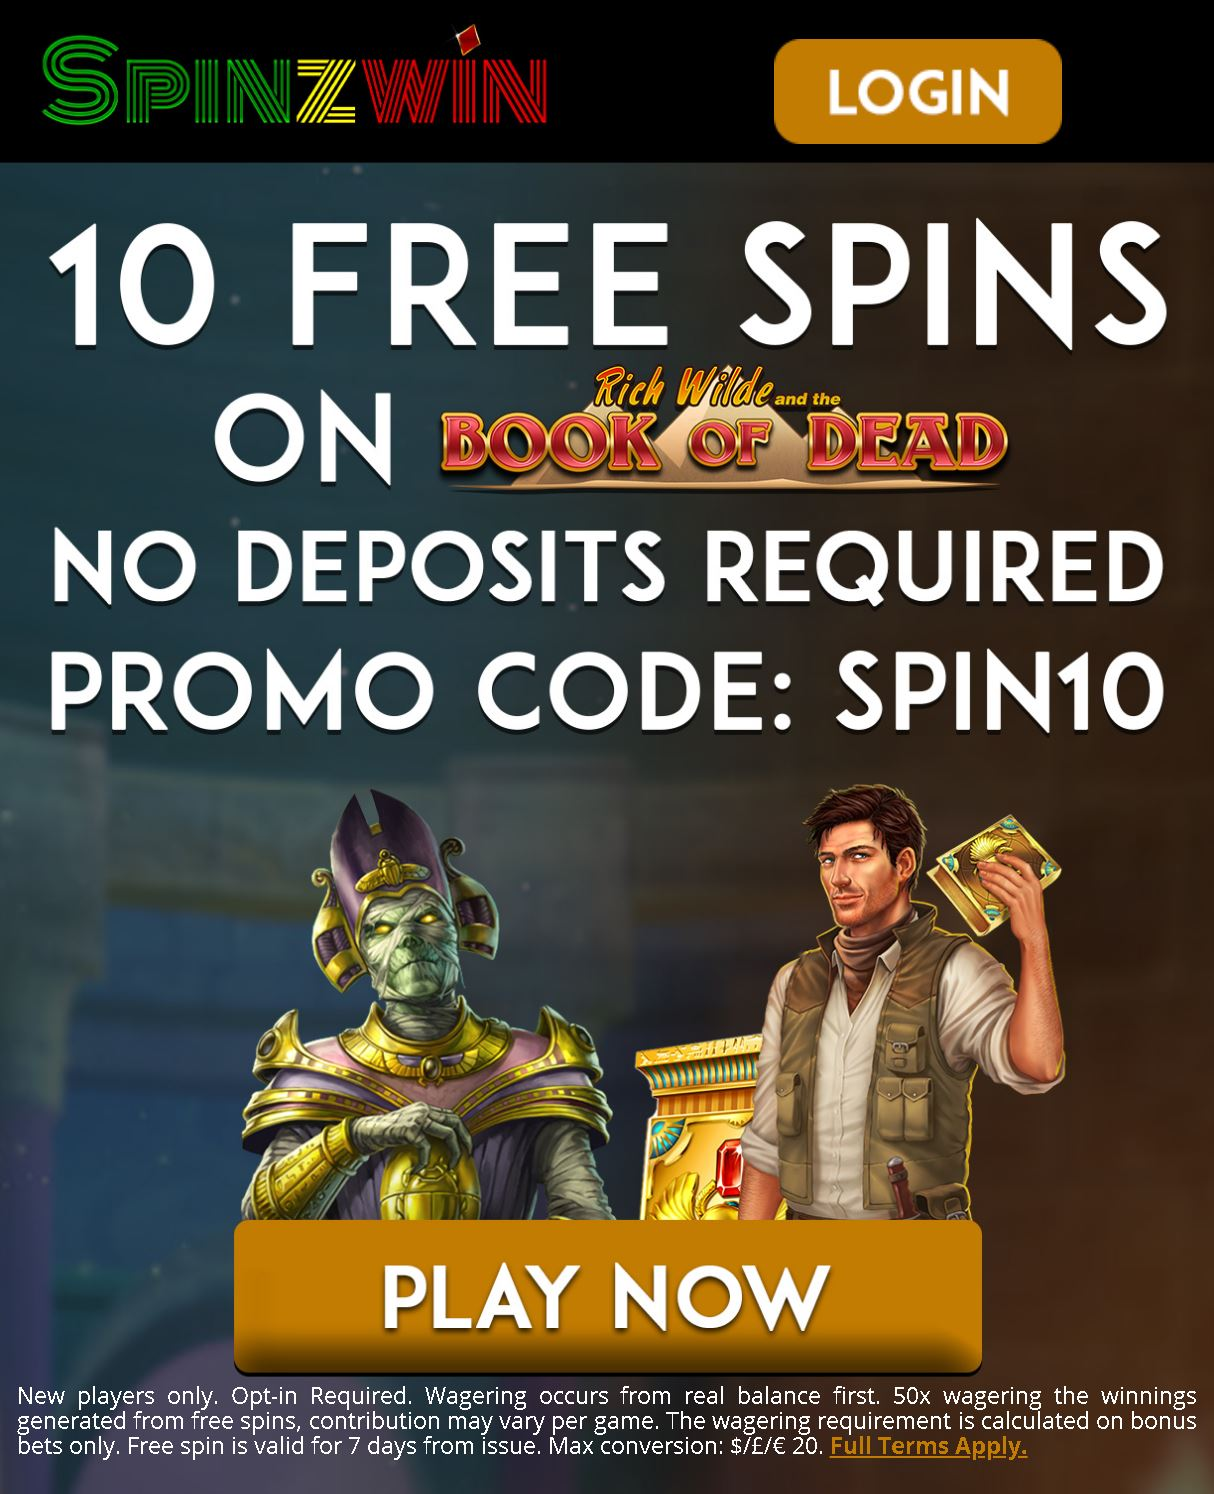 Spinzwin casino no deposit